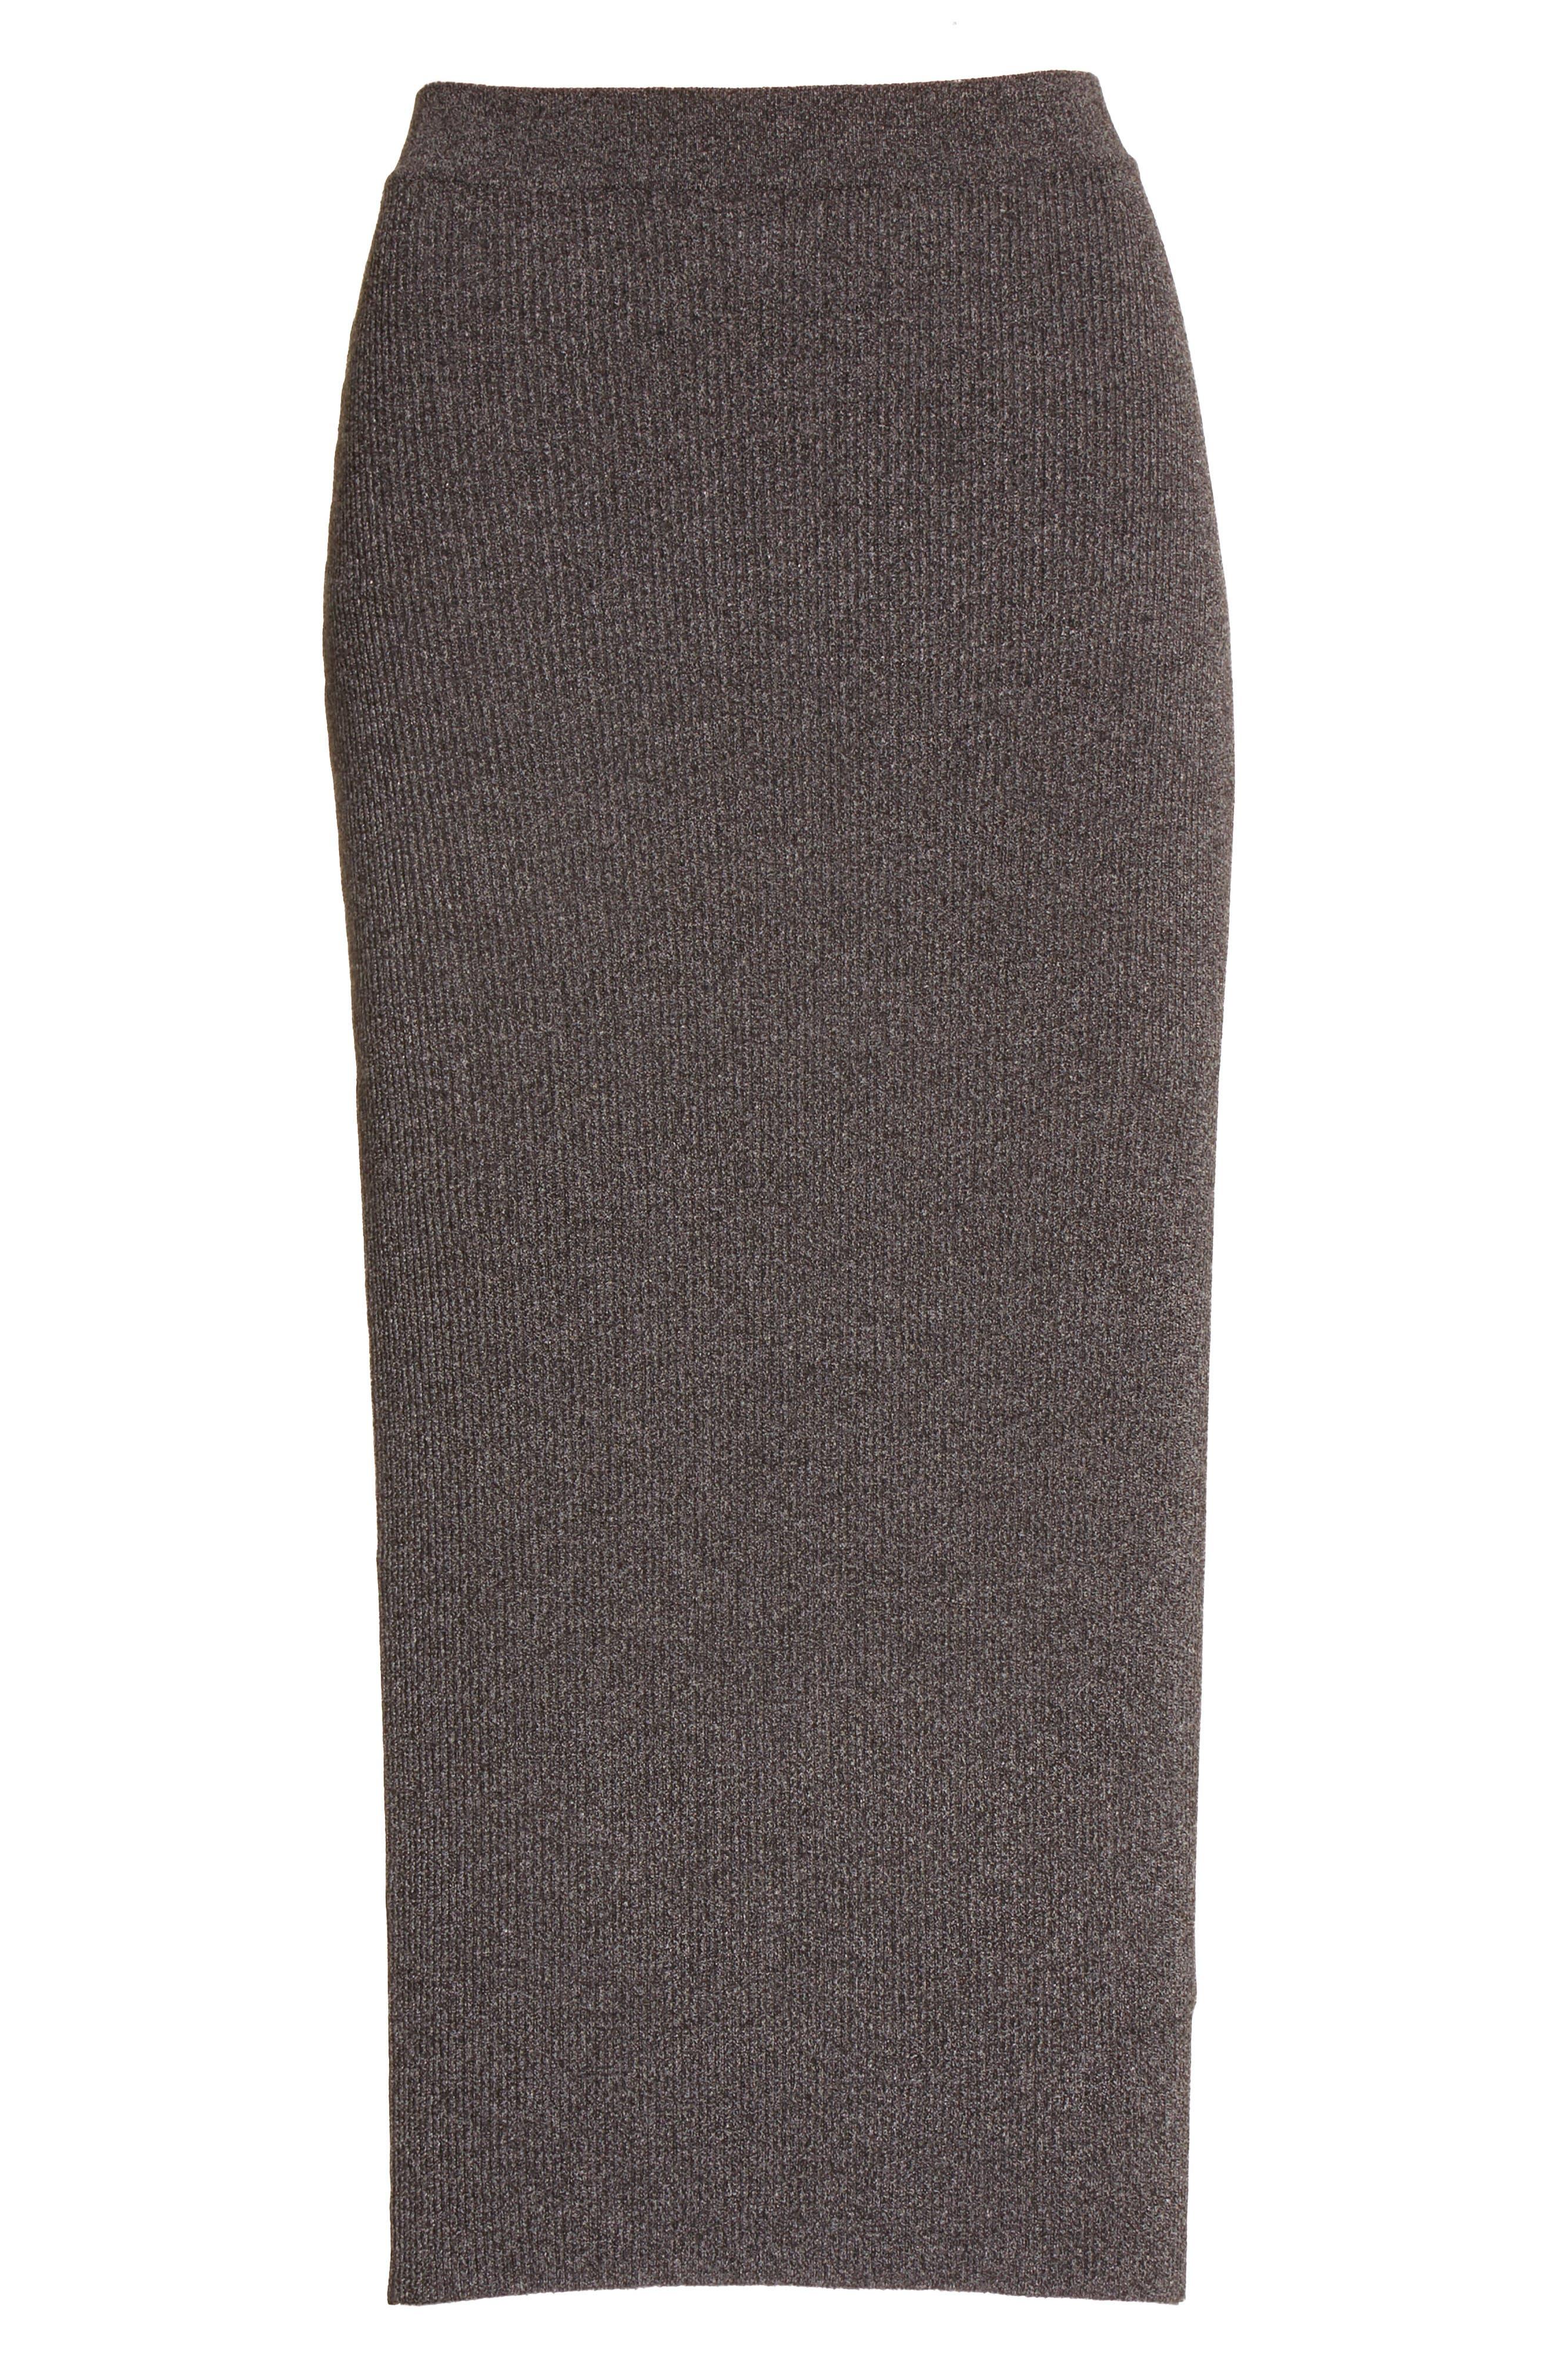 Alternate Image 4  - Armani Jeans Rib Knit Midi Skirt